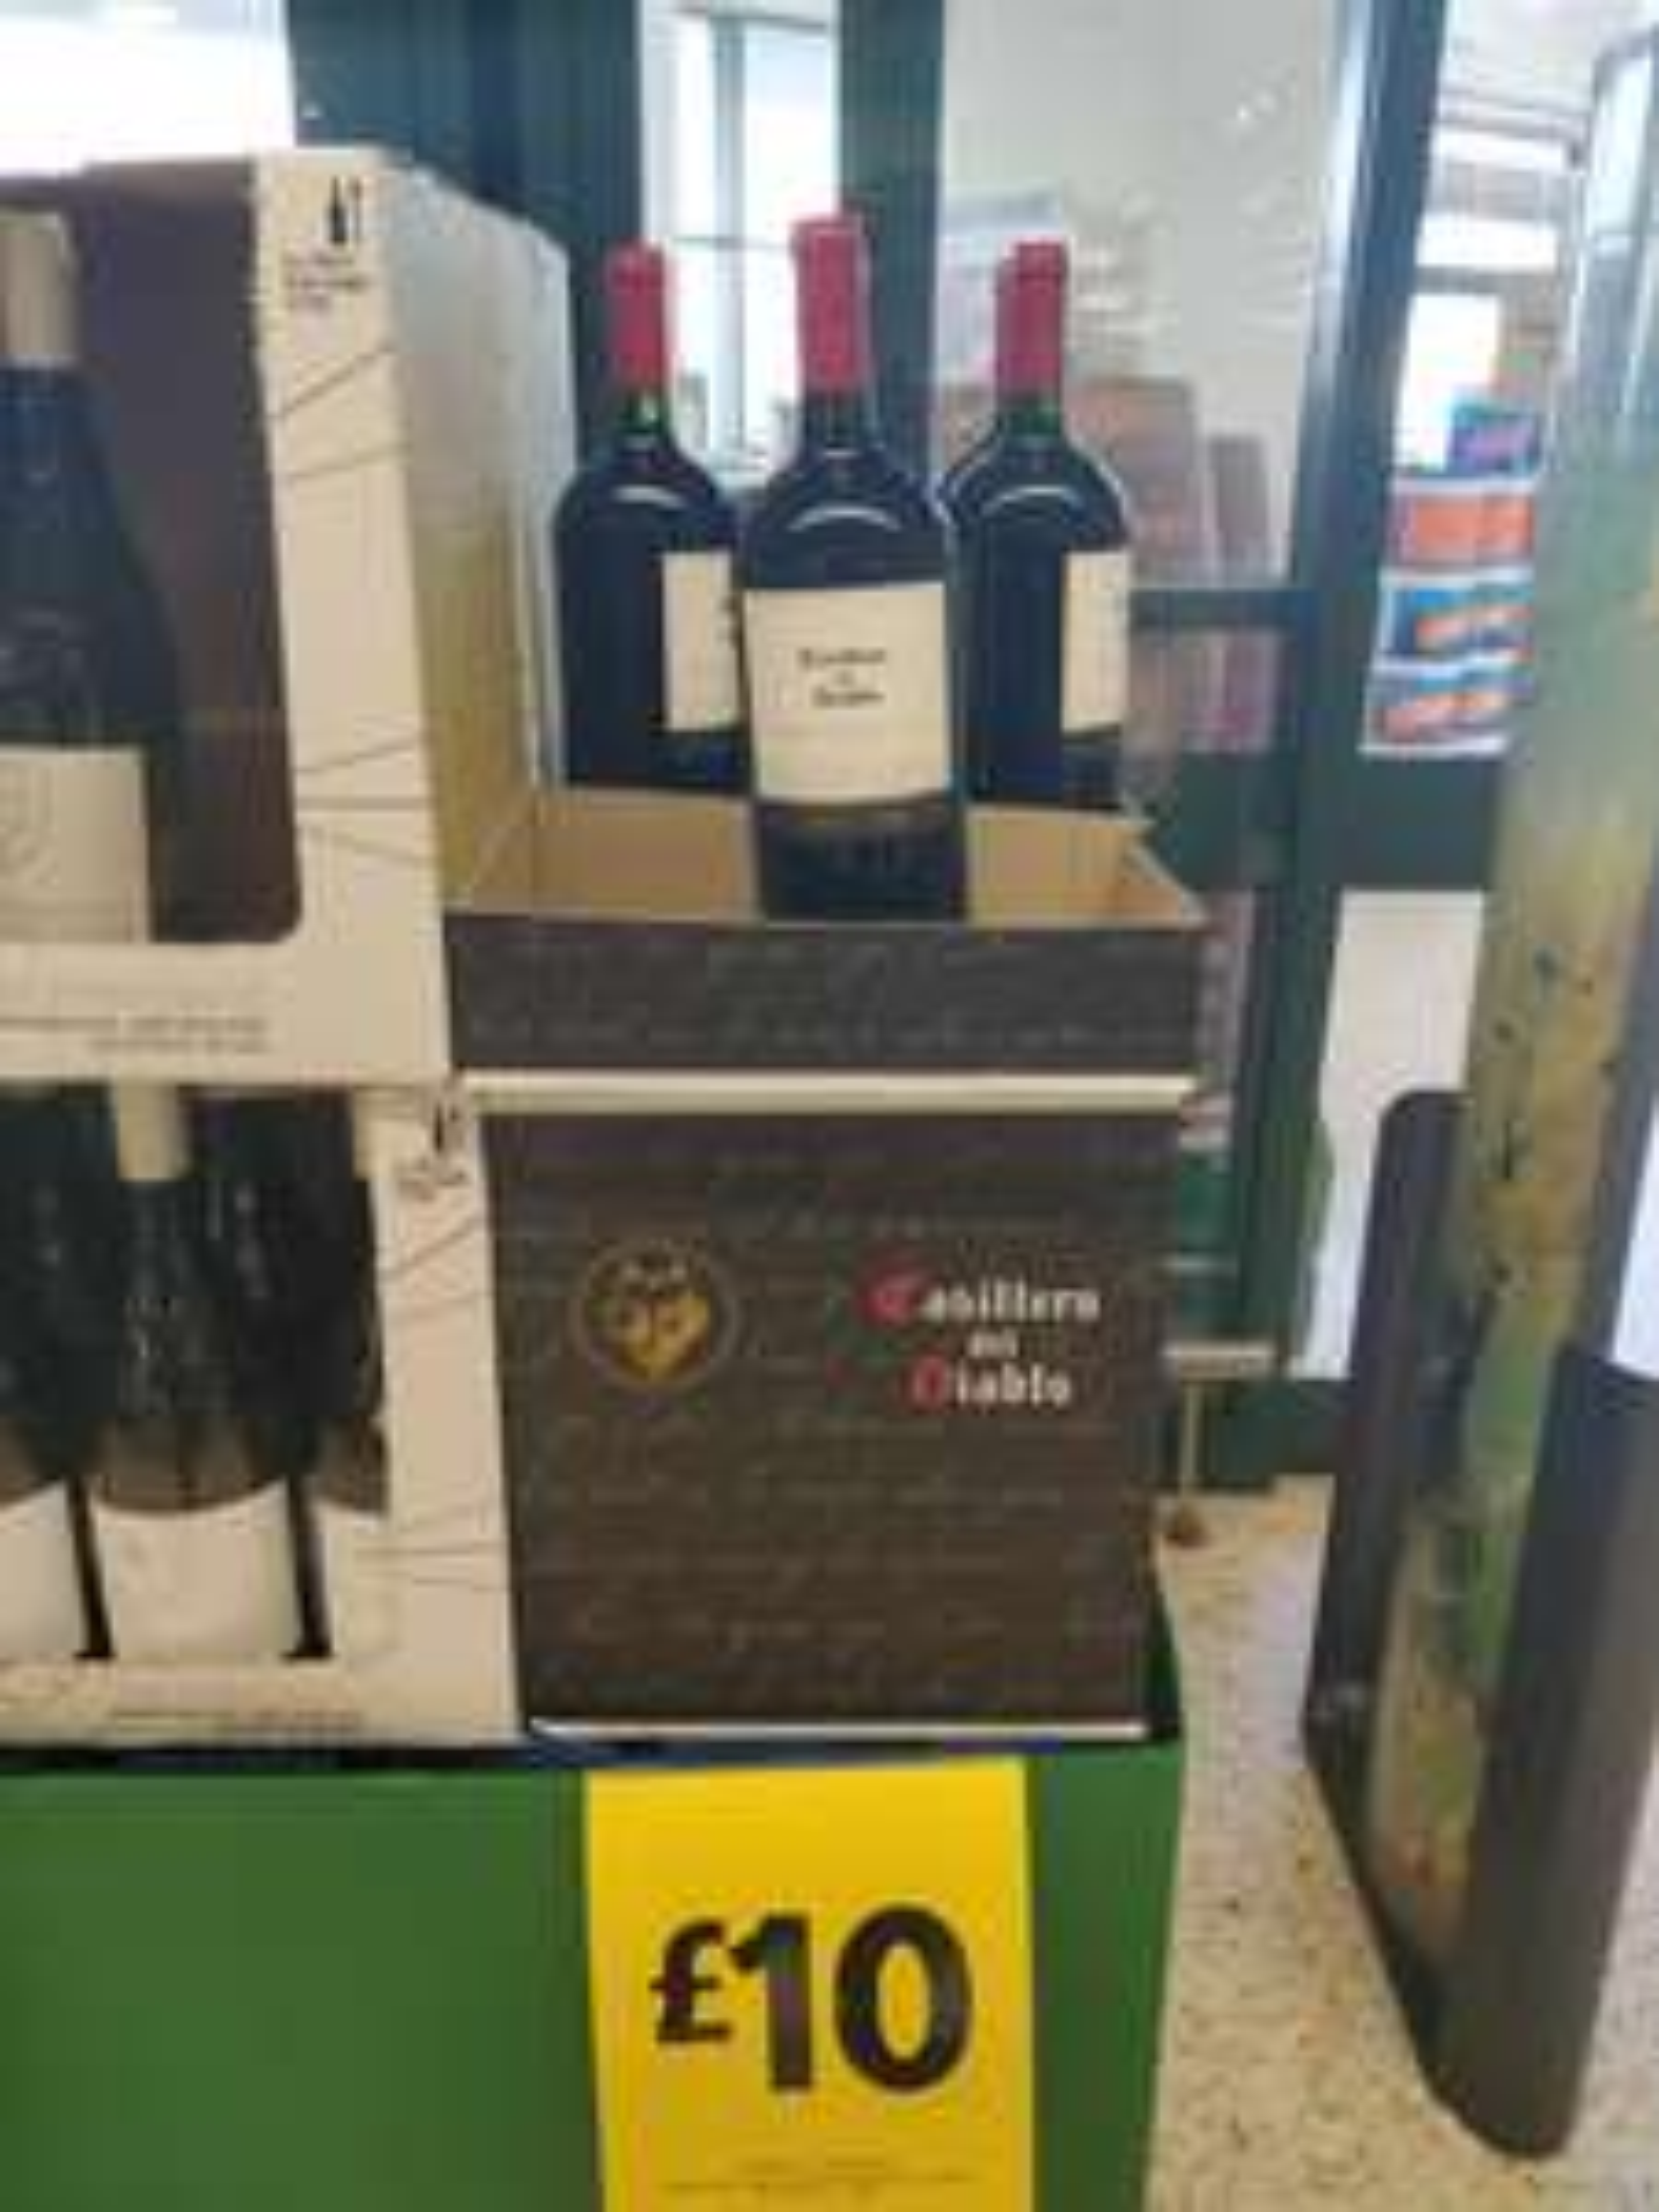 Morrisons,1.5ltr CasIllero del diablo, Cabernet Sauvigon - £10